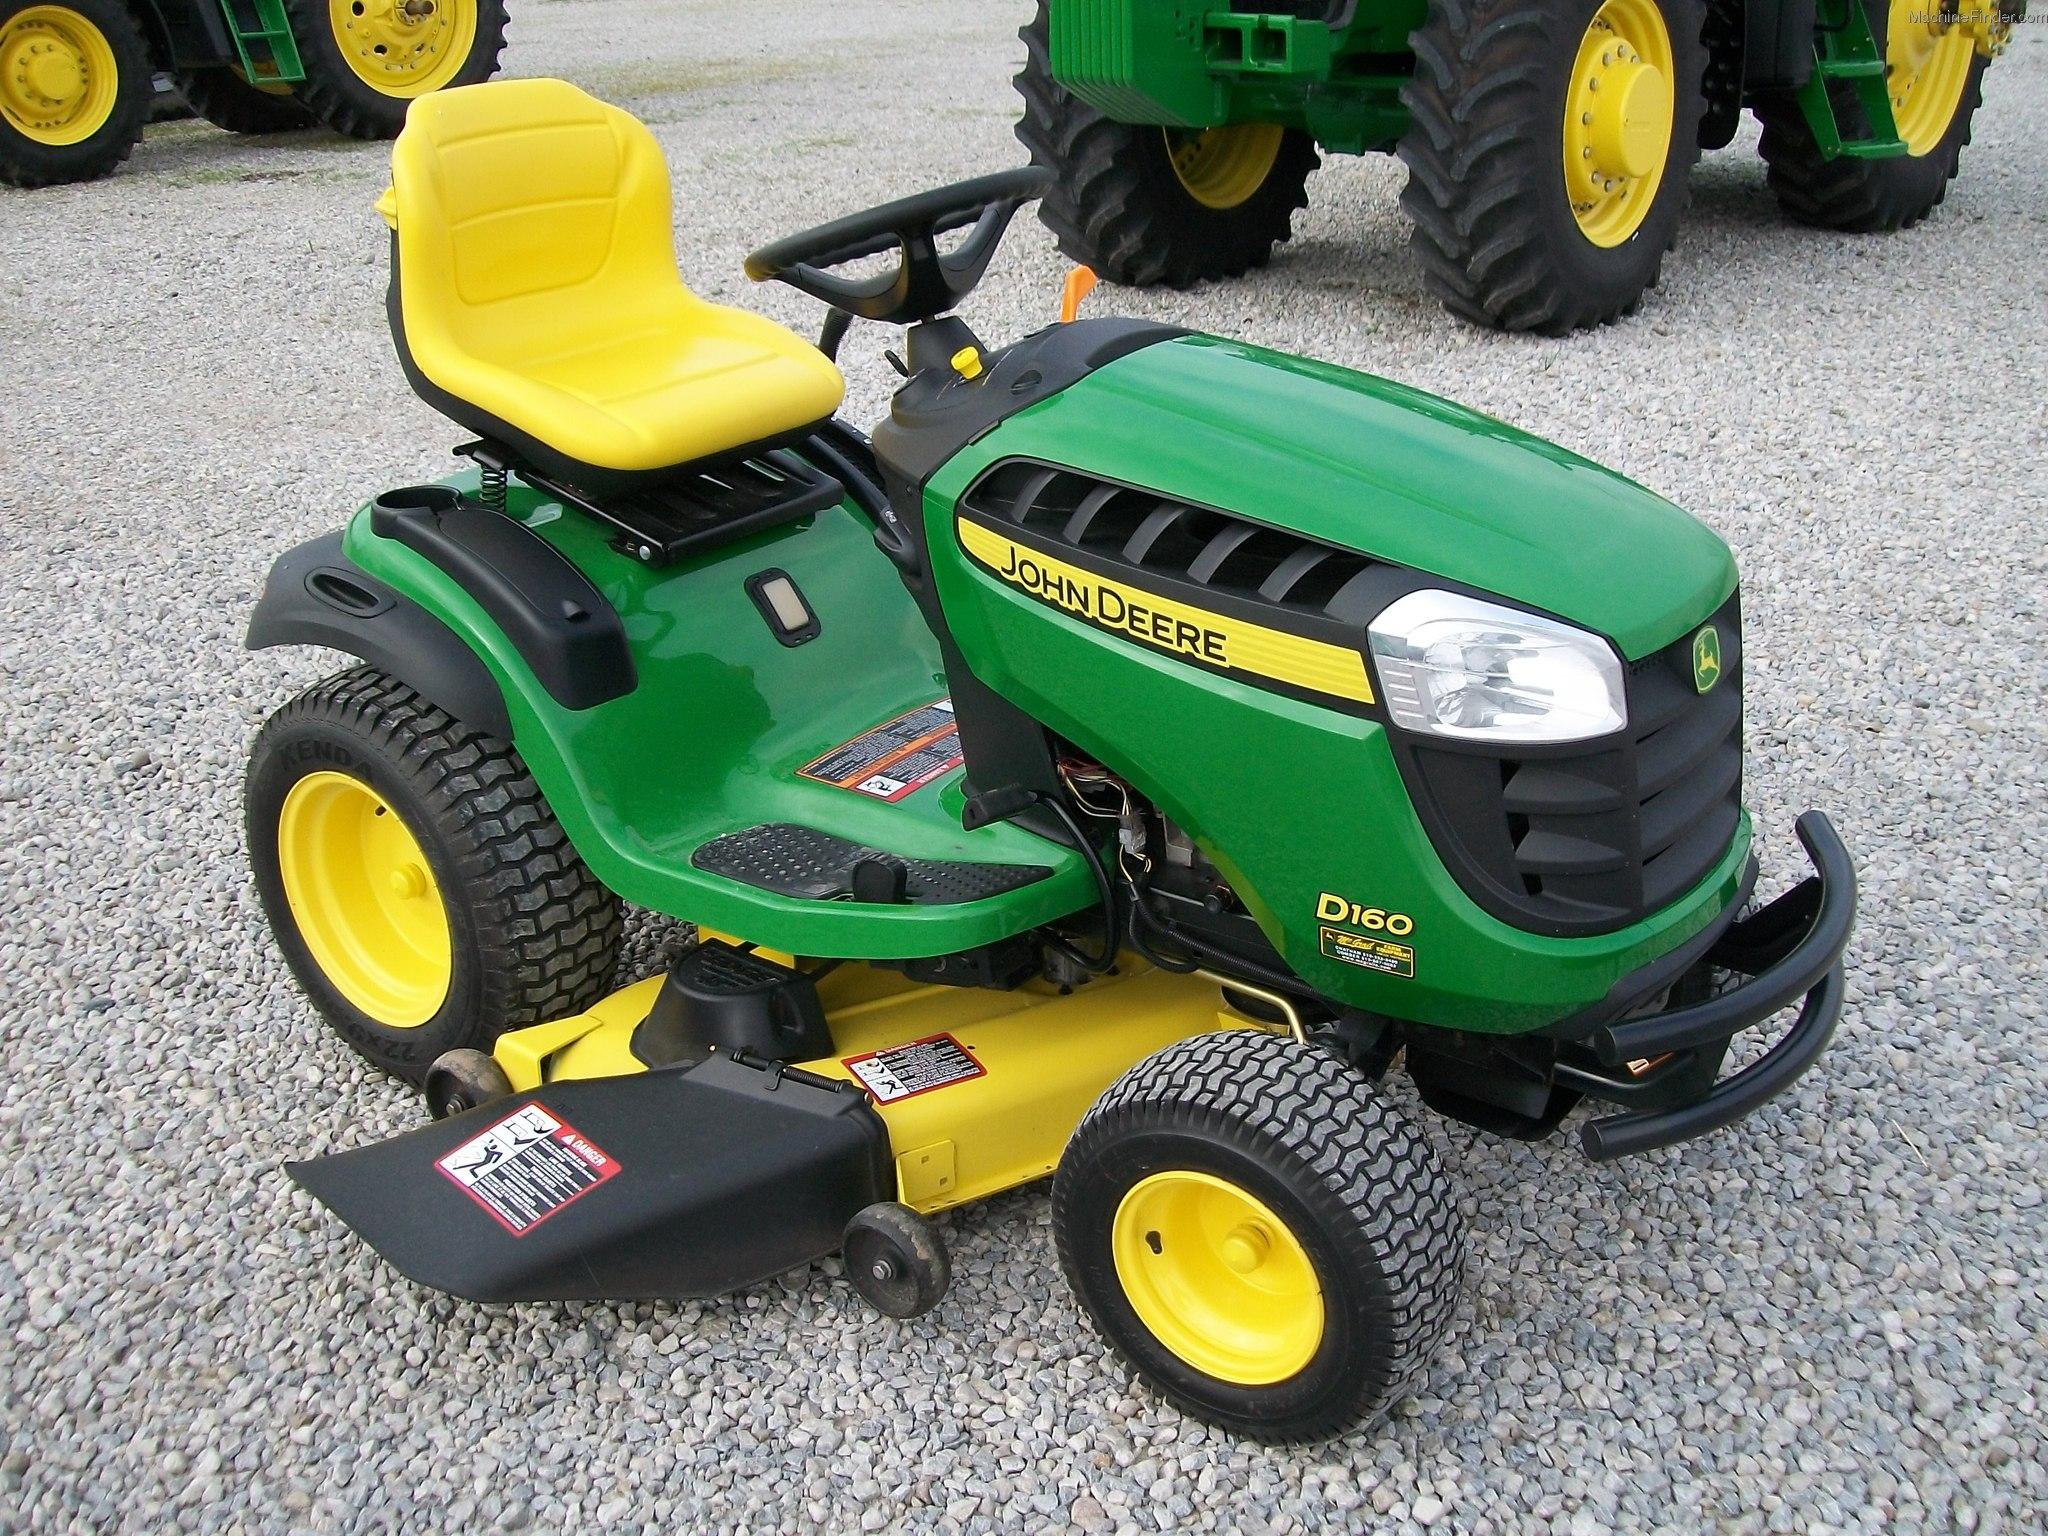 john deere x330 vs d160 lawn tractor comparison